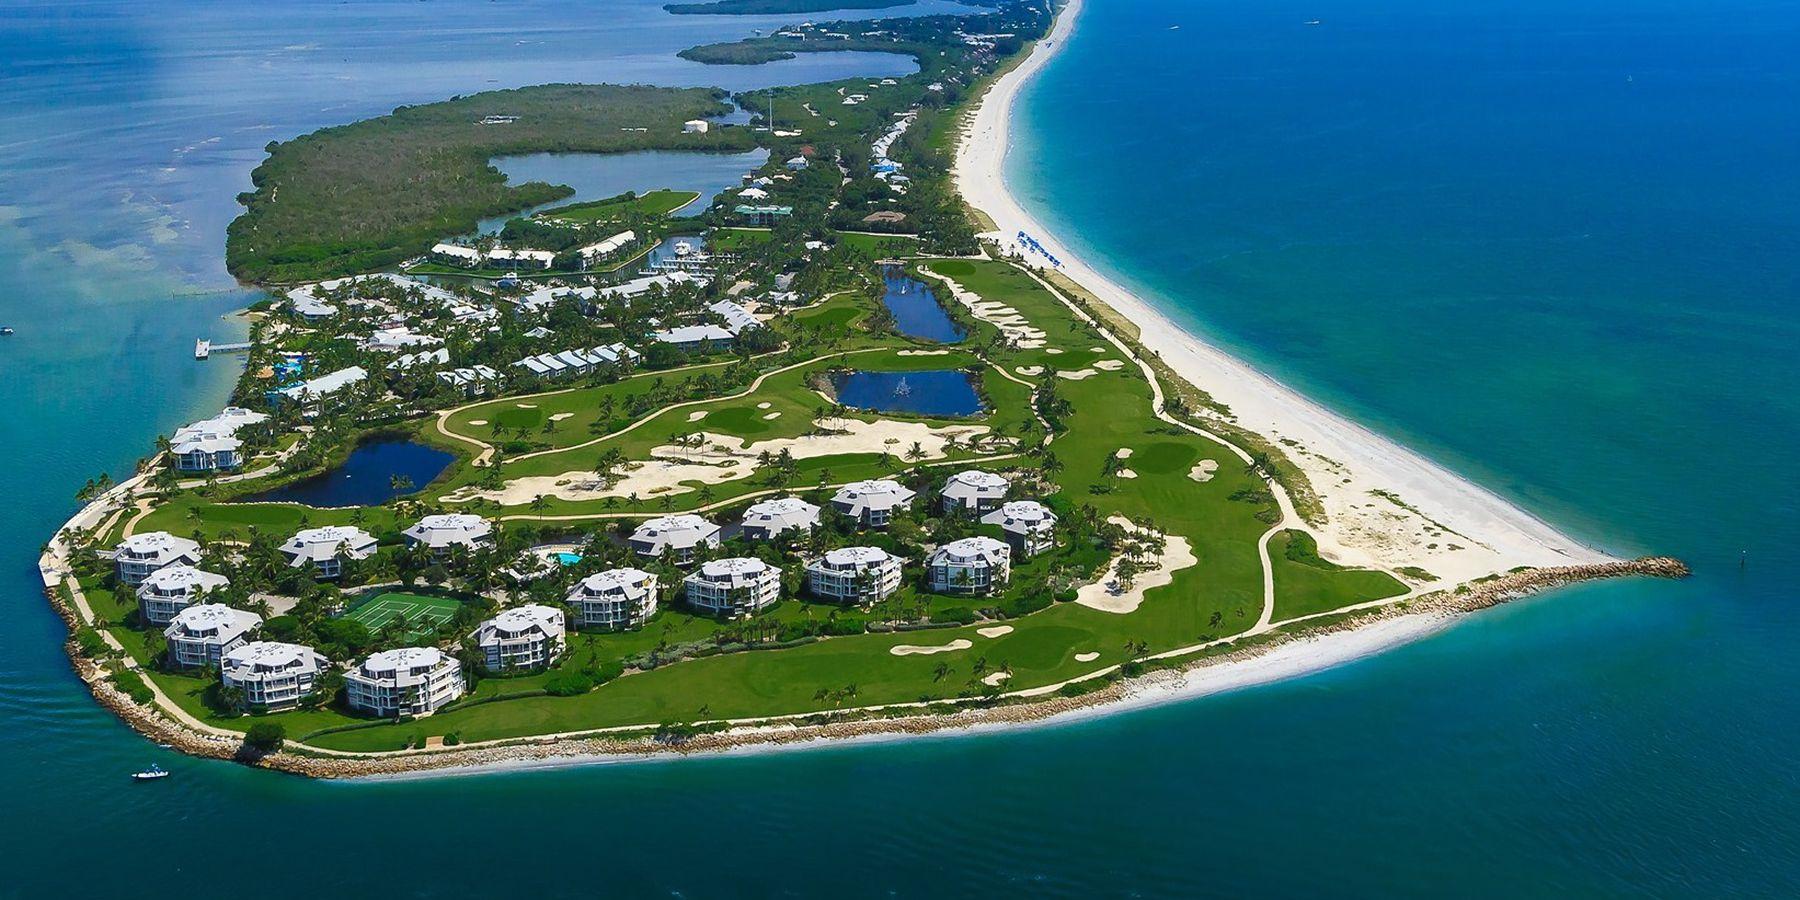 South Seas Island Resort - Florida vakantie - Strandvakantie Florida - Doets Reizen